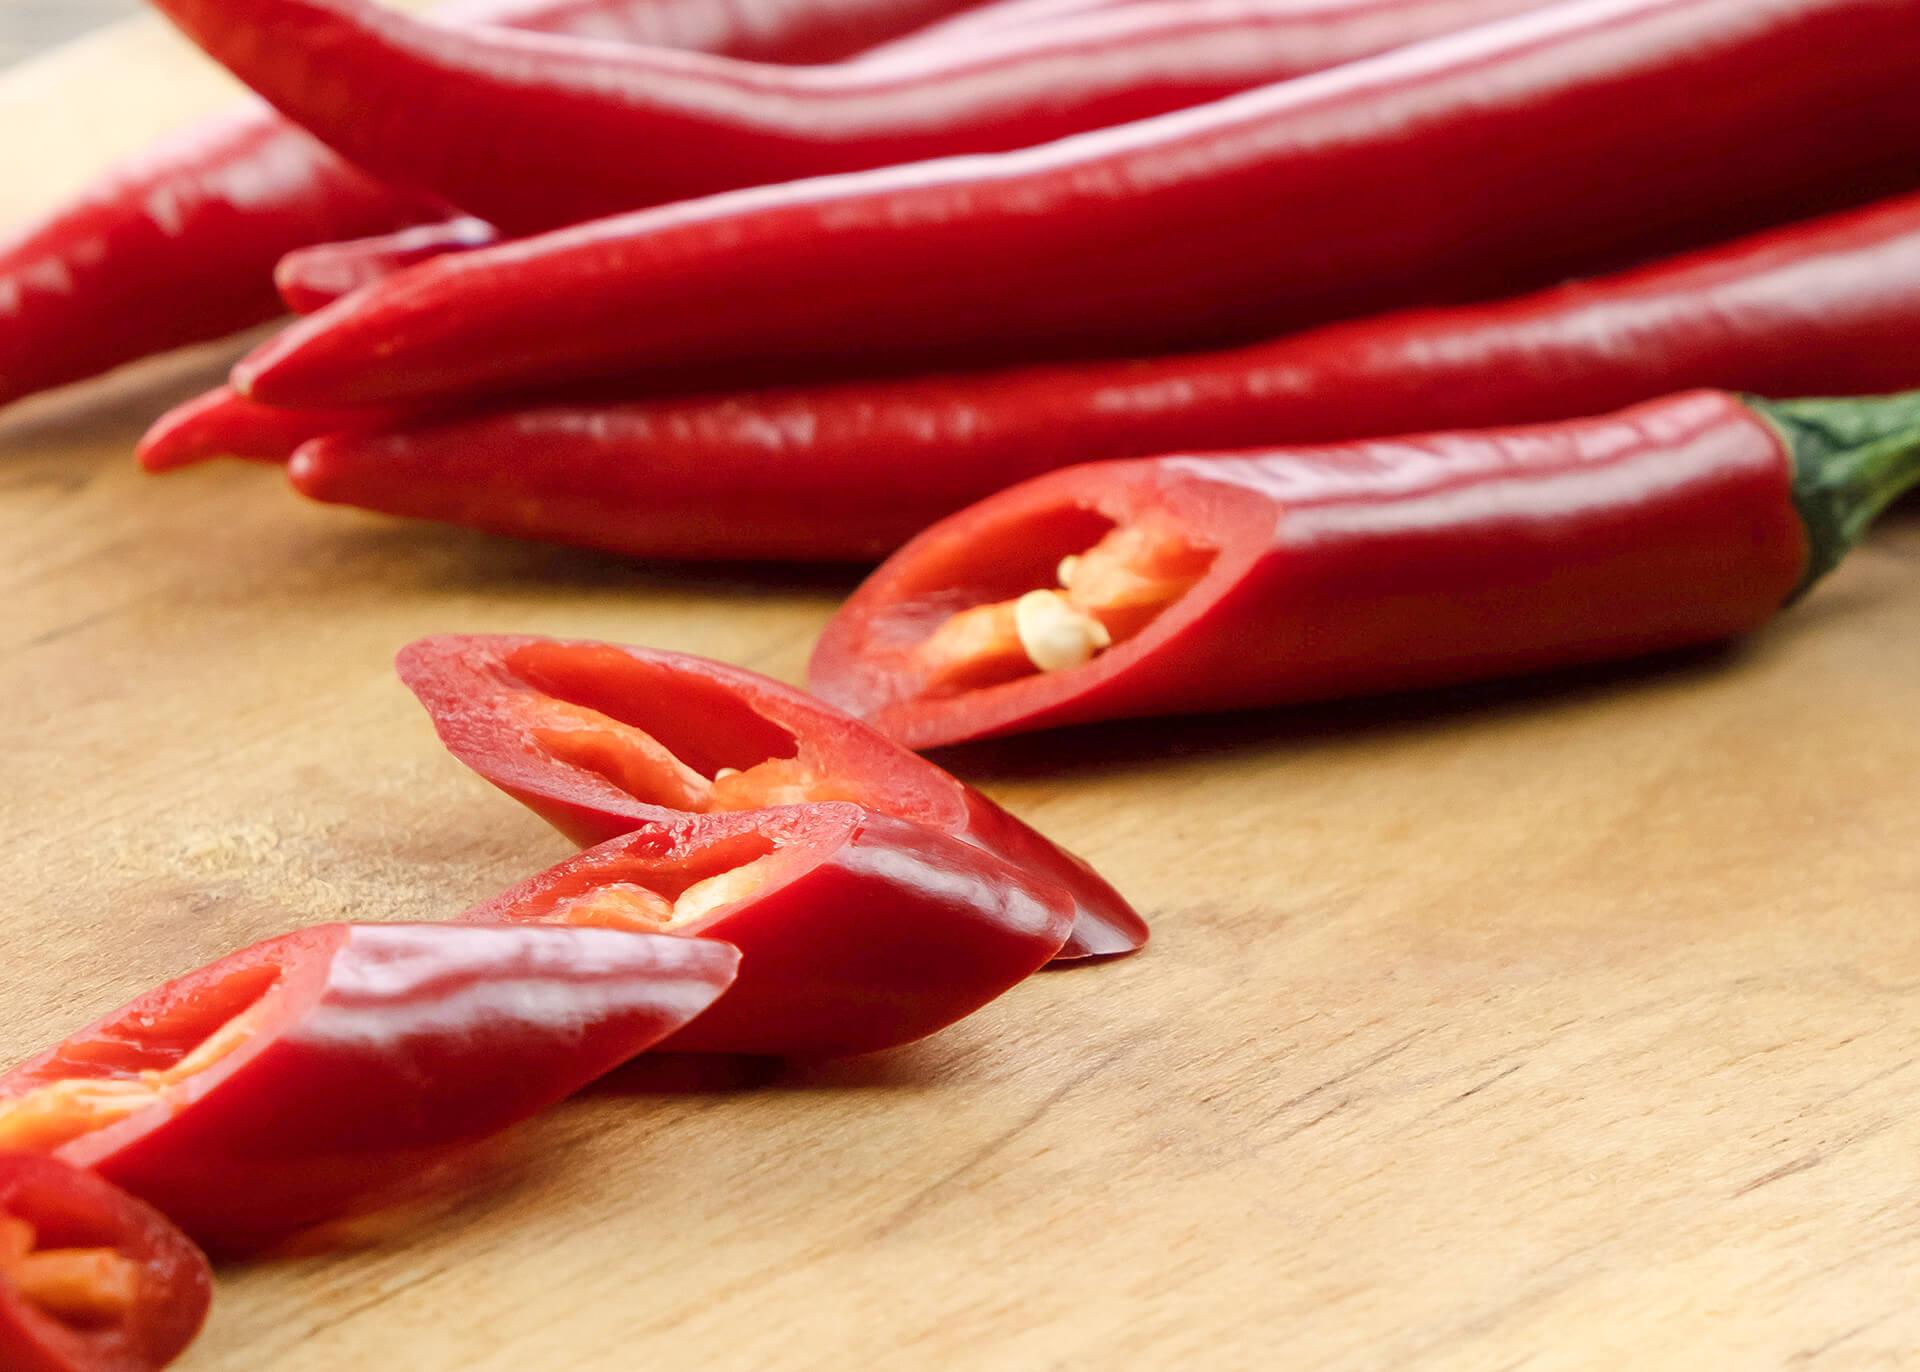 Pepperoni Einleitung